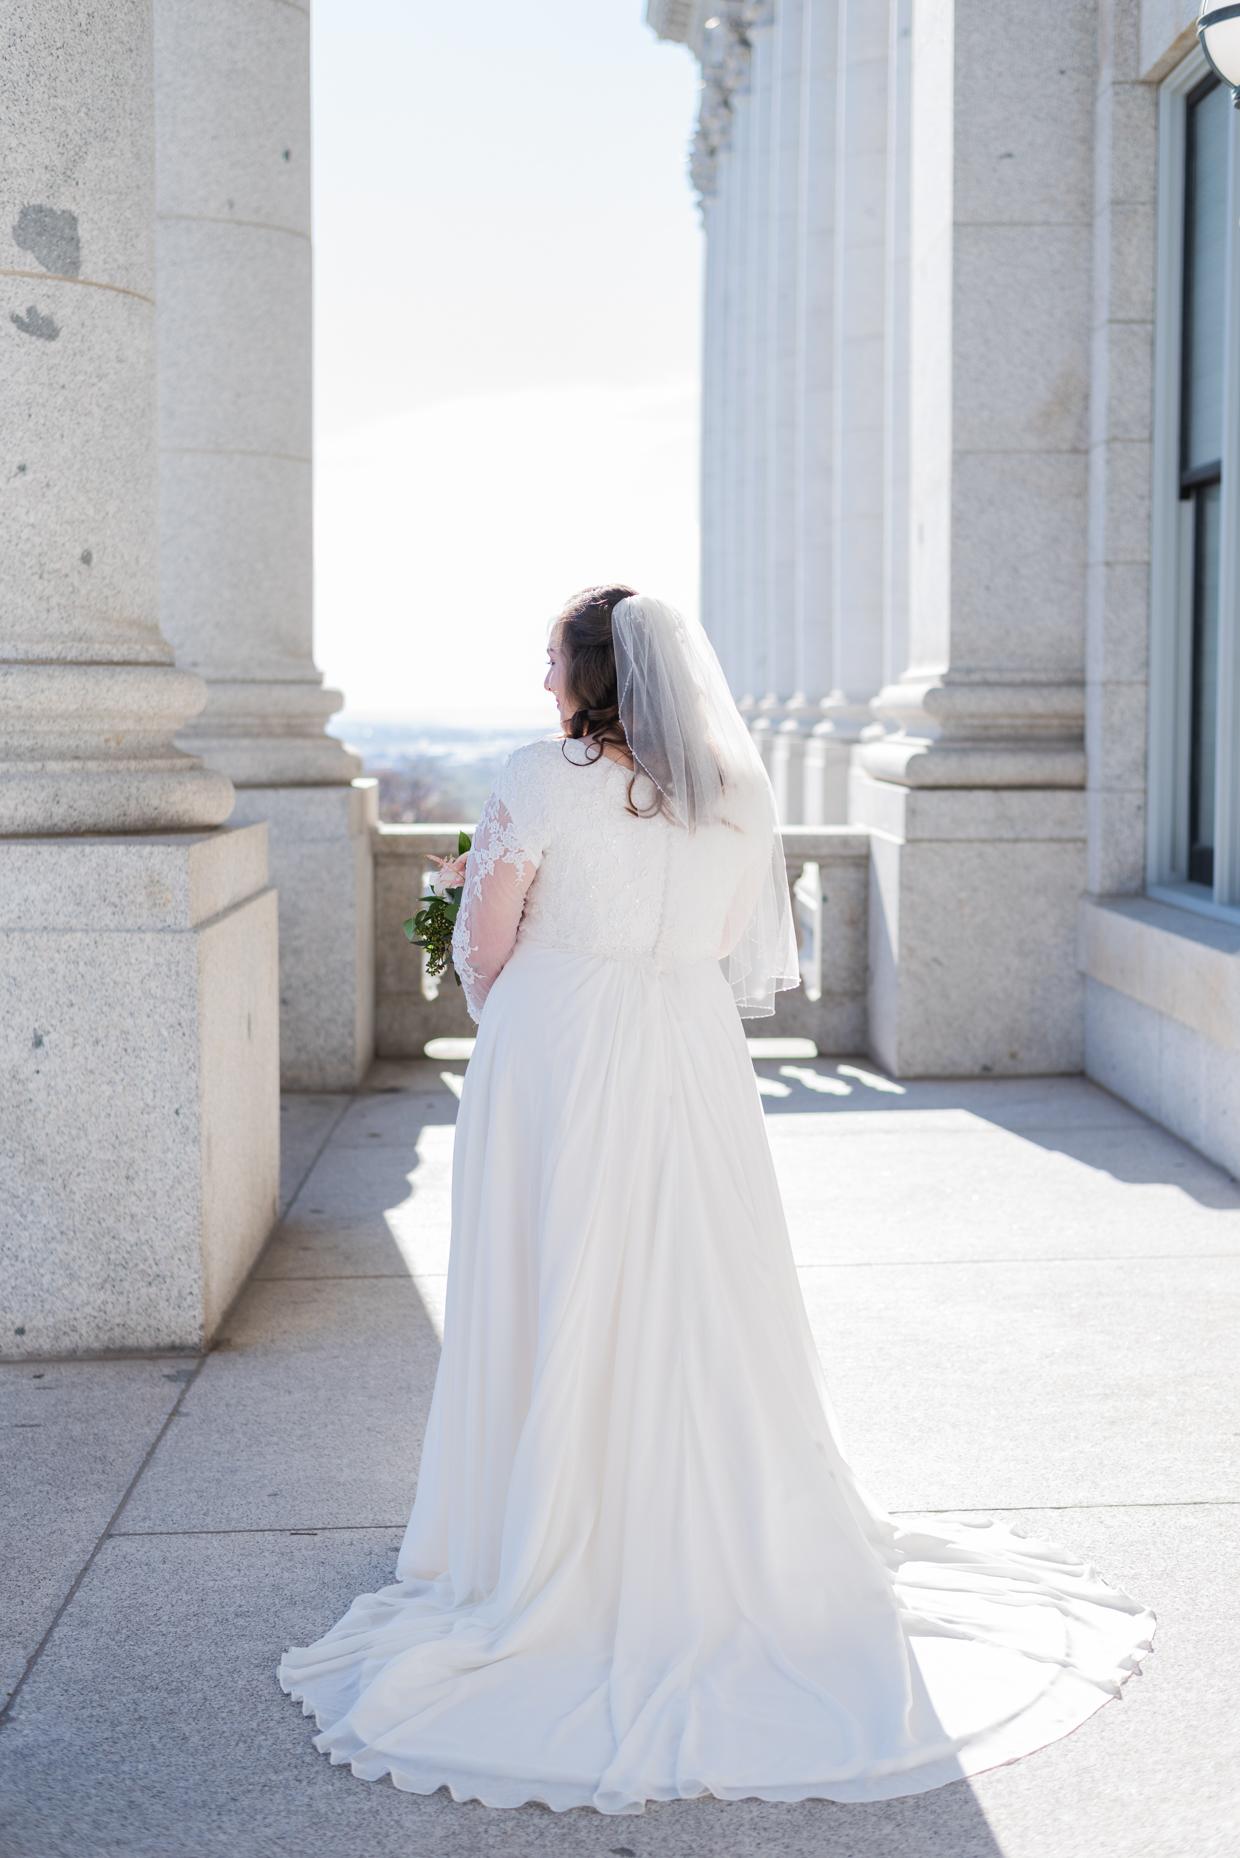 bailey.dayel bridals-6.jpg